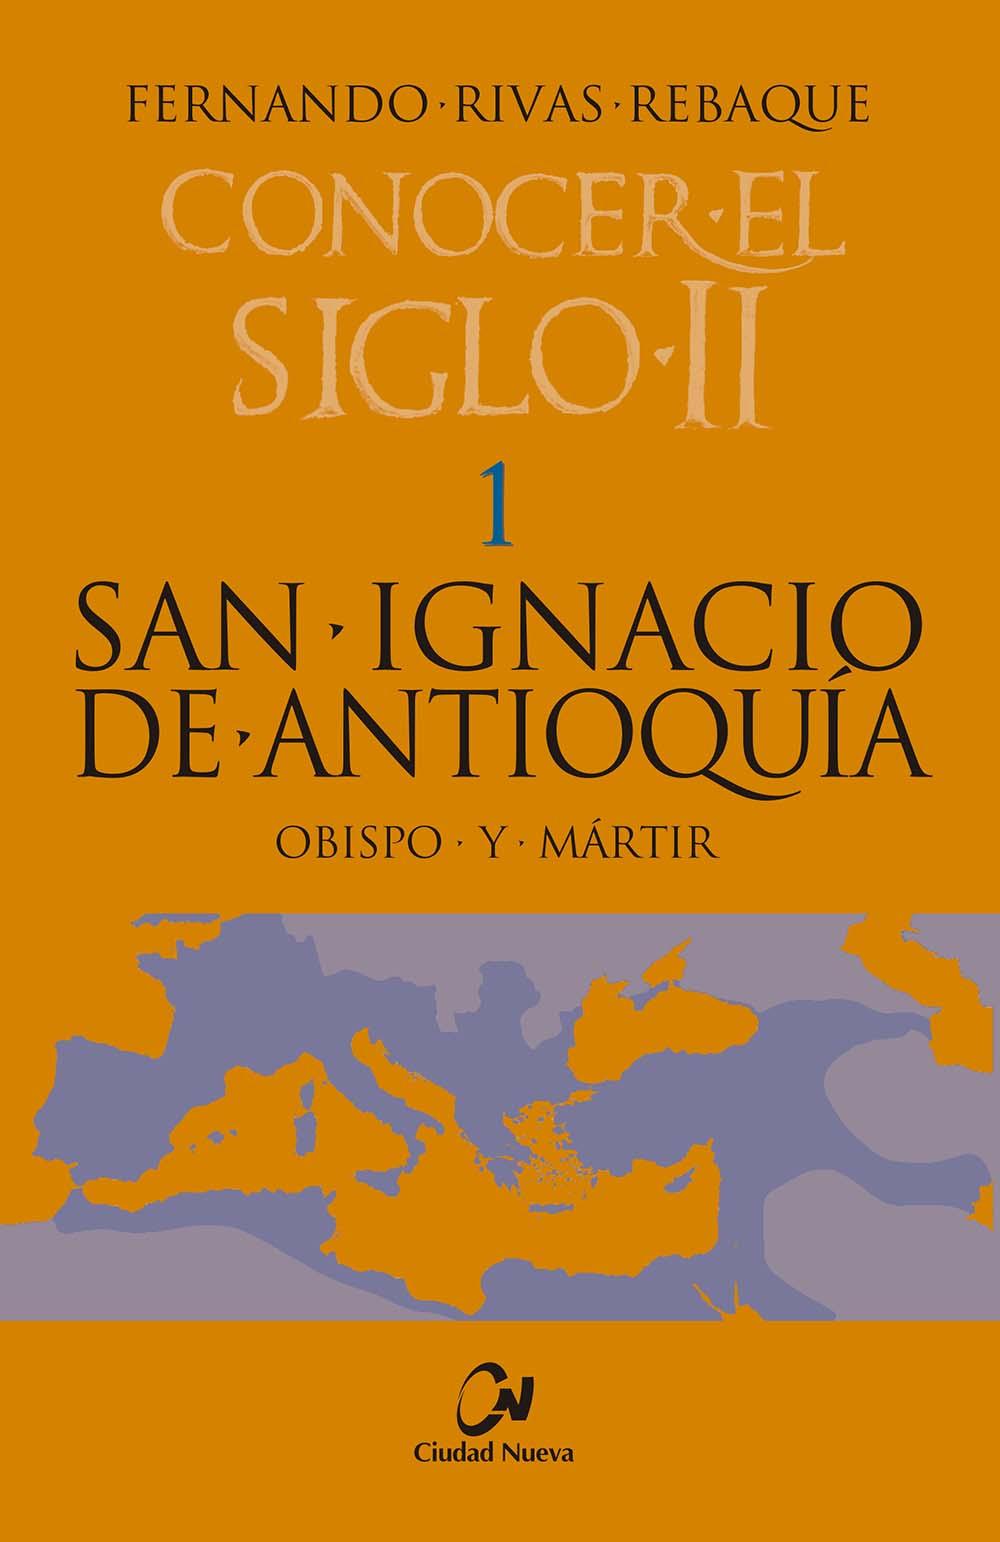 san-ignacio-de-antioquia